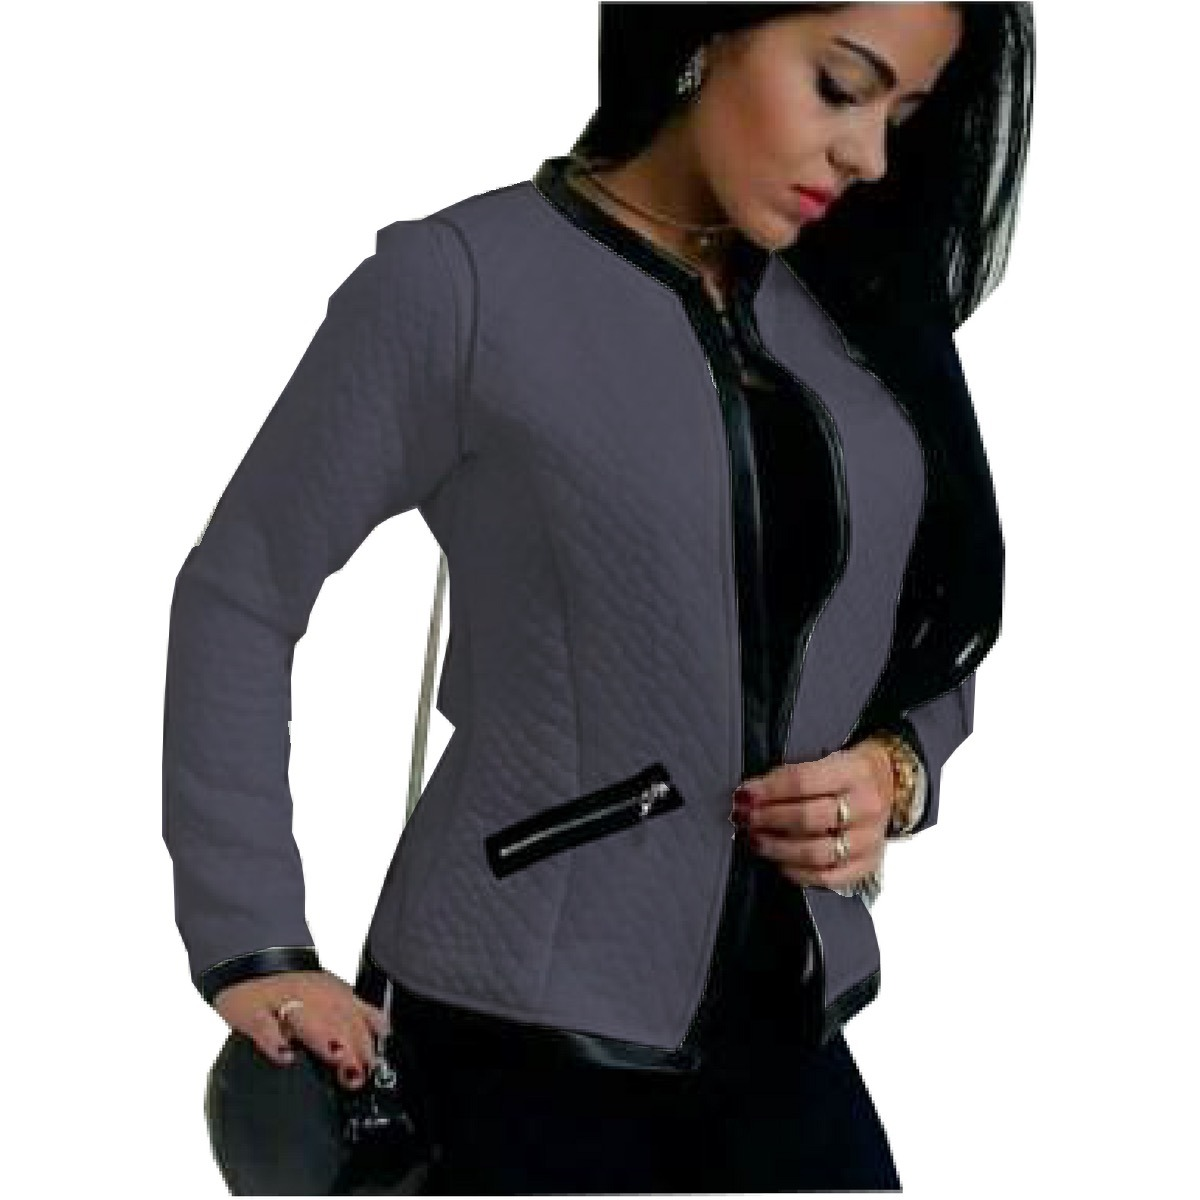 81fb3ac42 blazer casaco jaqueta matelassê feminino inverno · blazer casaco feminino. blazer  casaco feminino. 8 Fotos